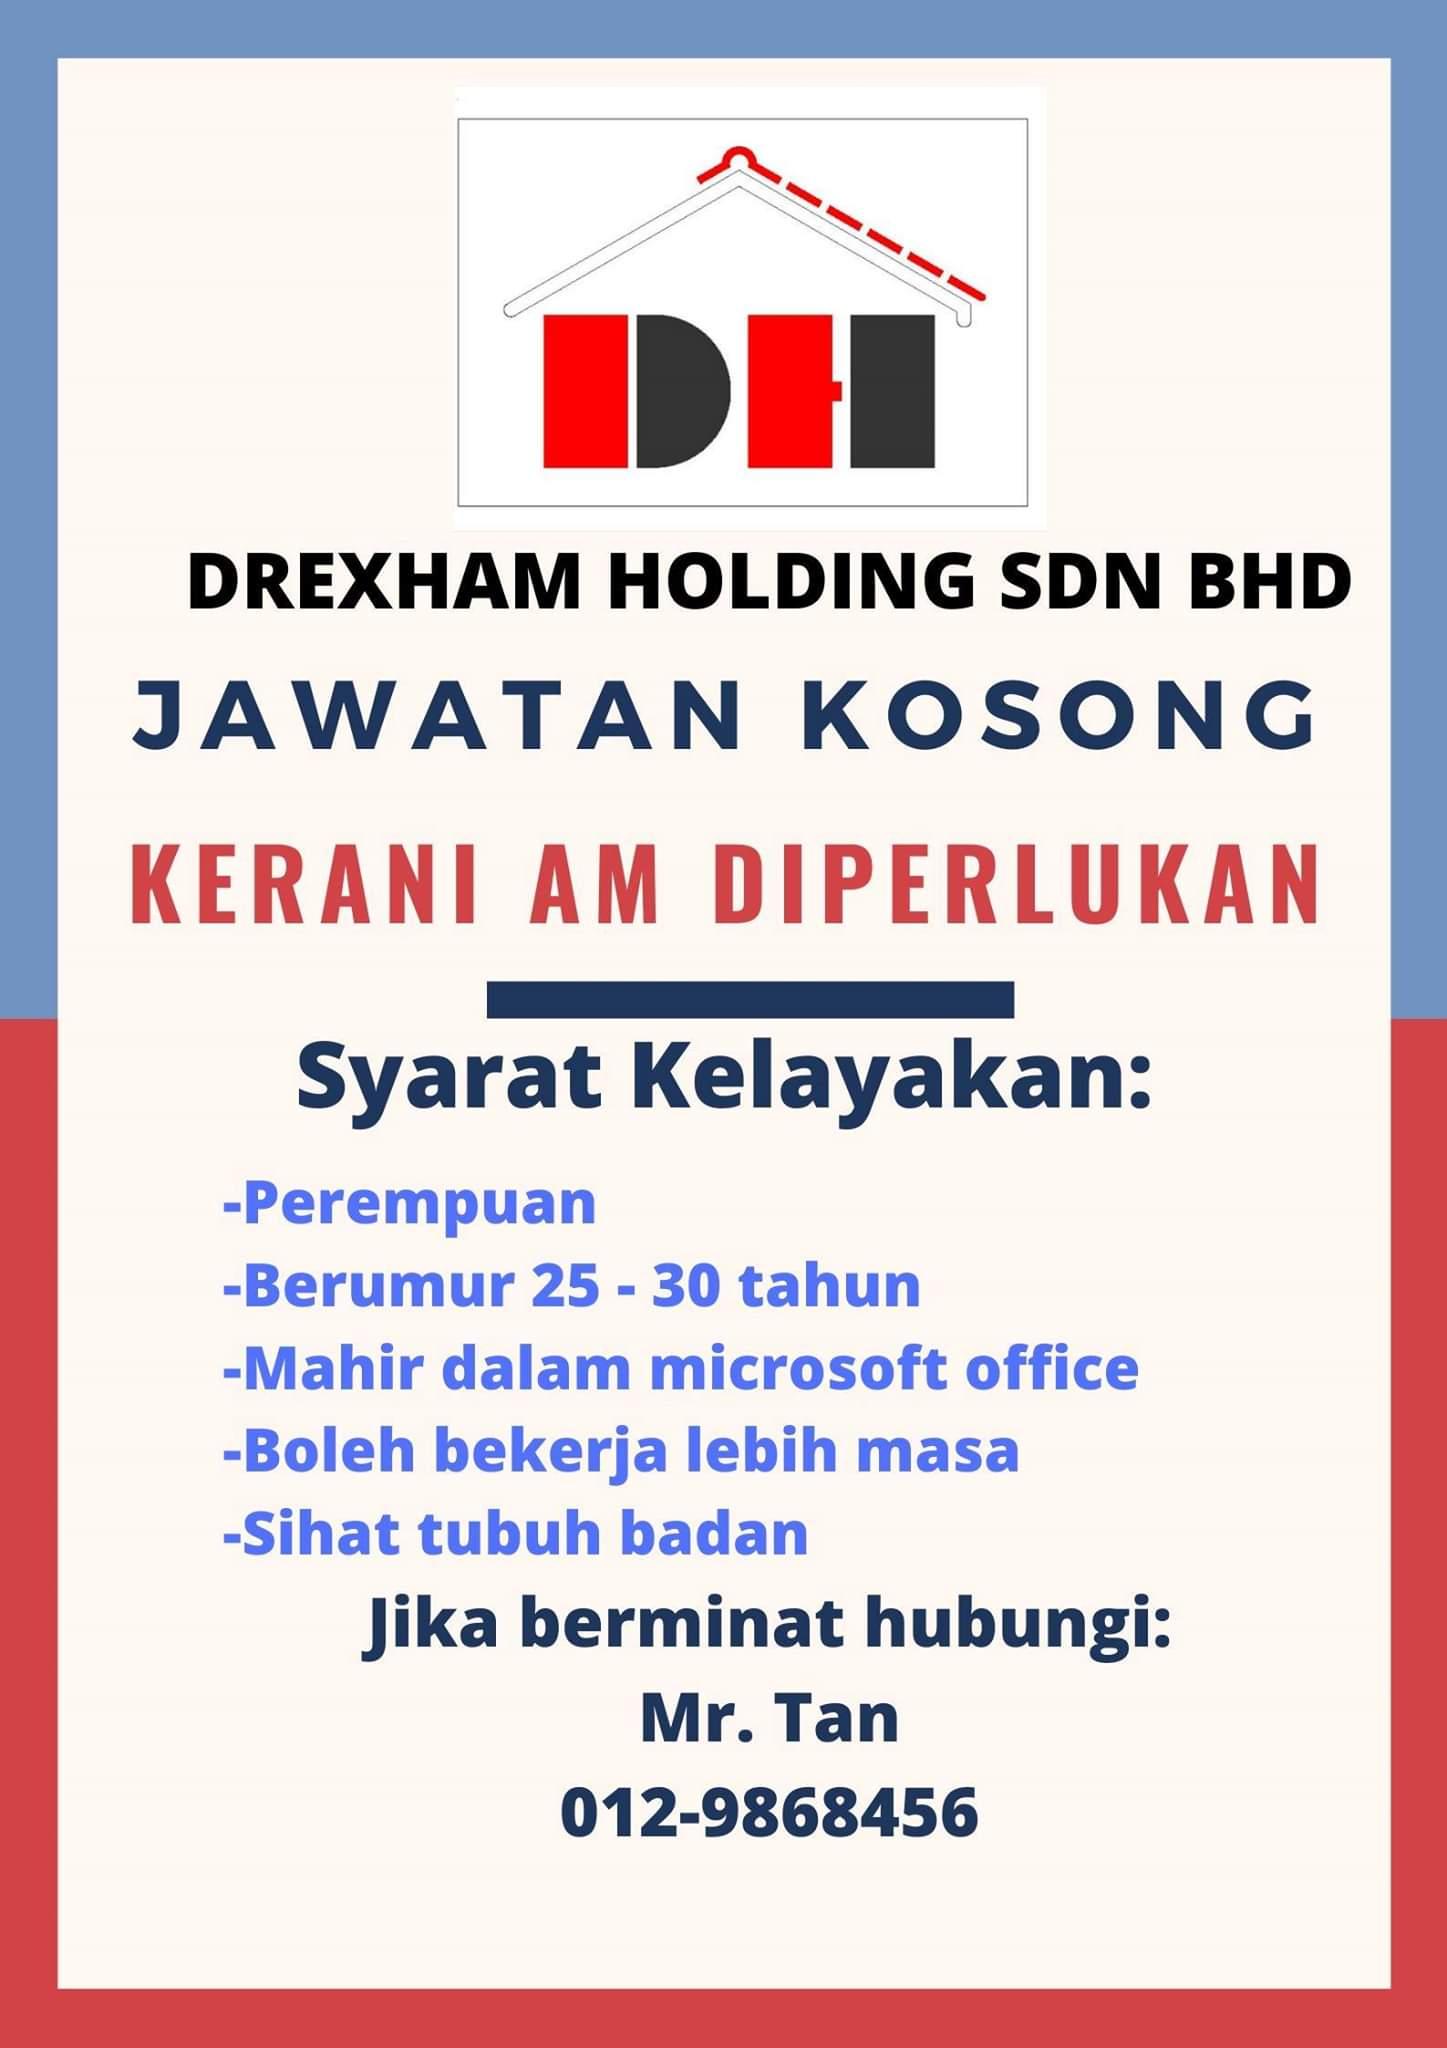 Jawatan Kosong Kerani Am Drexham Holding Sdn Bhd